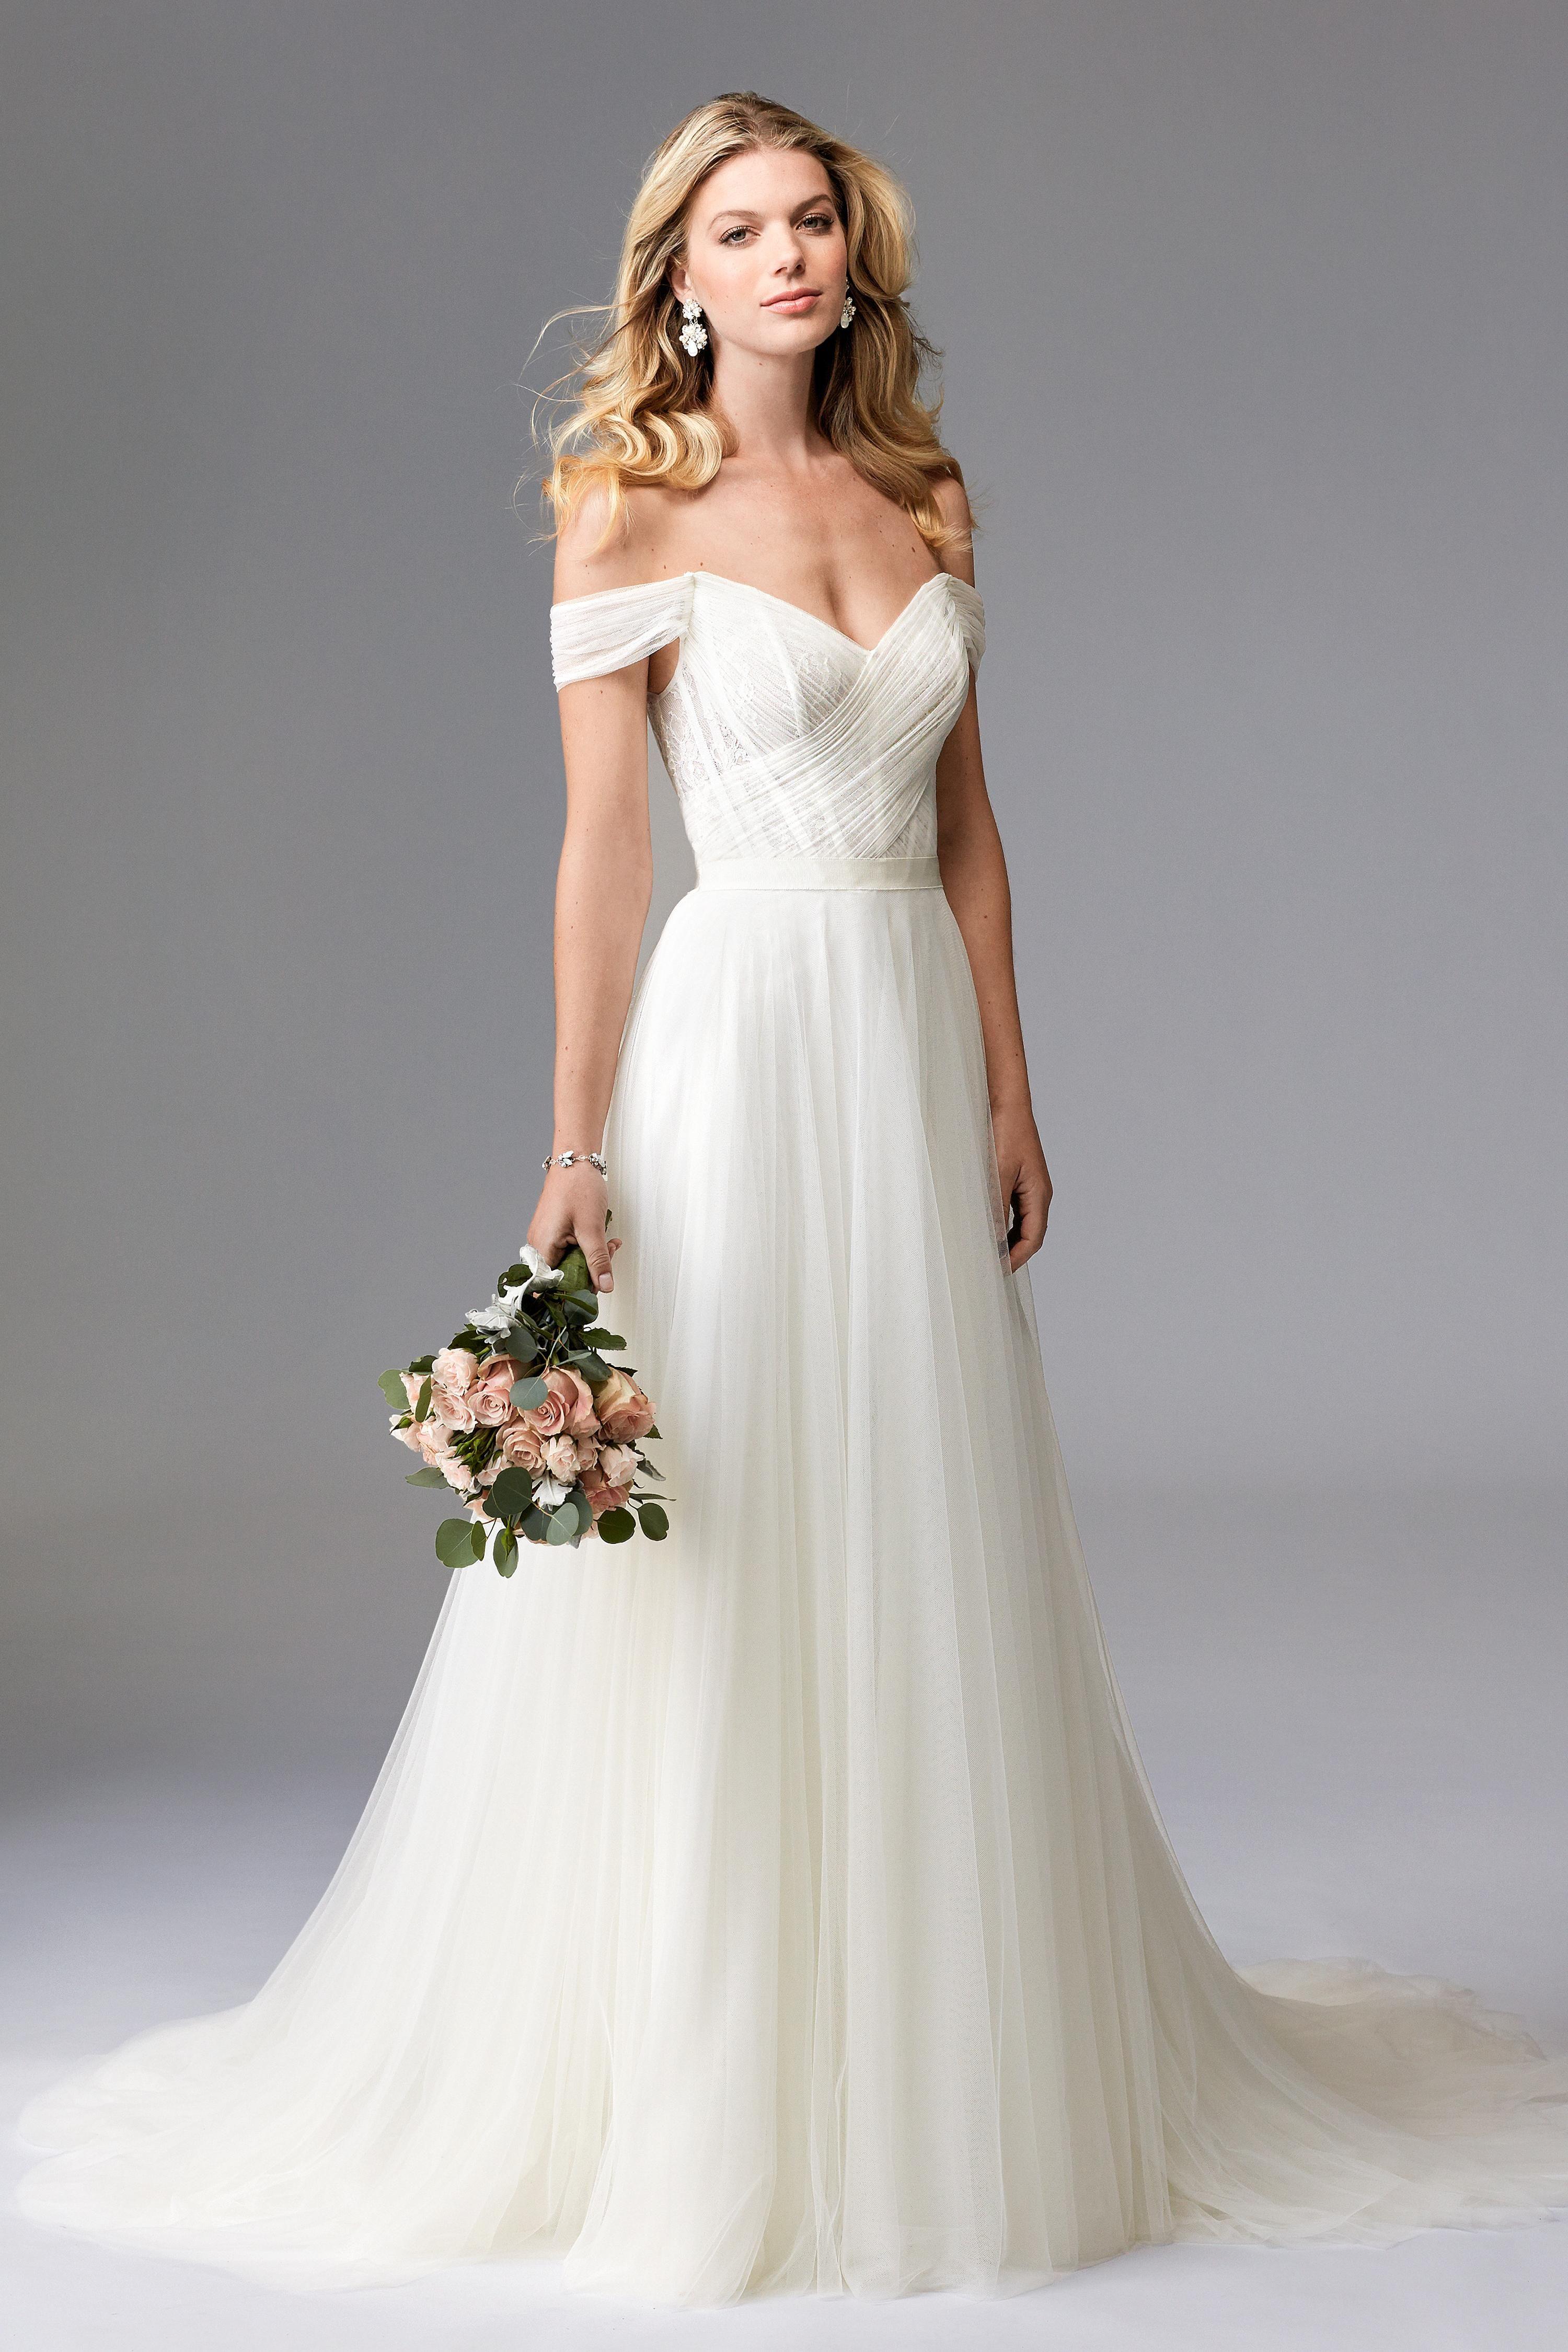 Romantic wedding gown bridalpulse wedding dress gallery wtoo romantic wedding gown bridalpulse wedding dress gallery wtoo brides fall 2016 floor ombrellifo Gallery